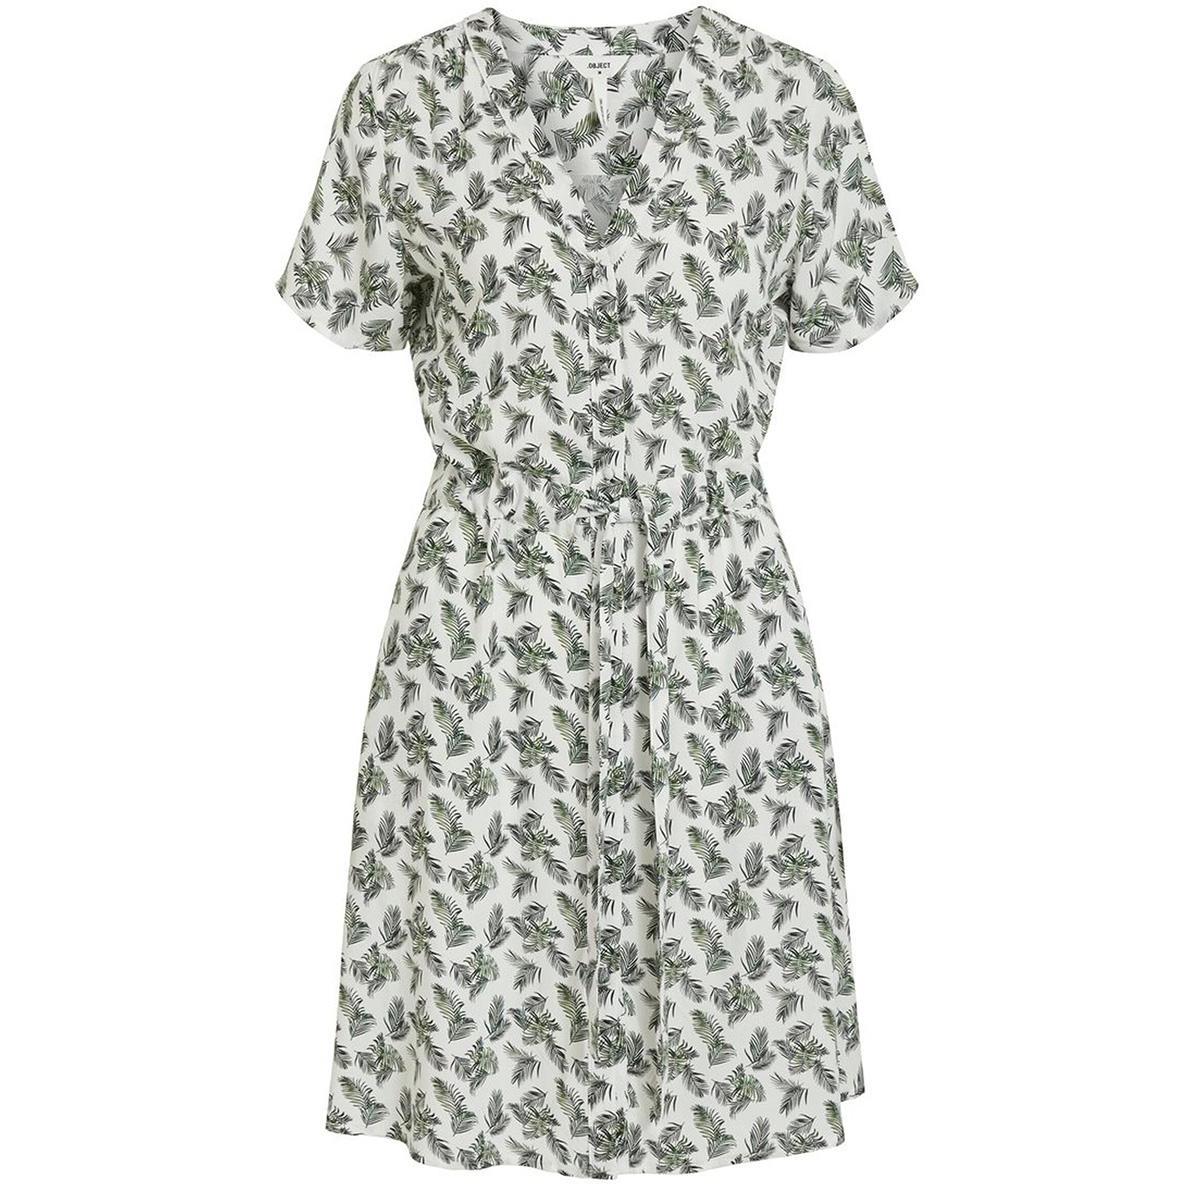 objceleste ss short dress 109 23032770 object jurk cloud dancer